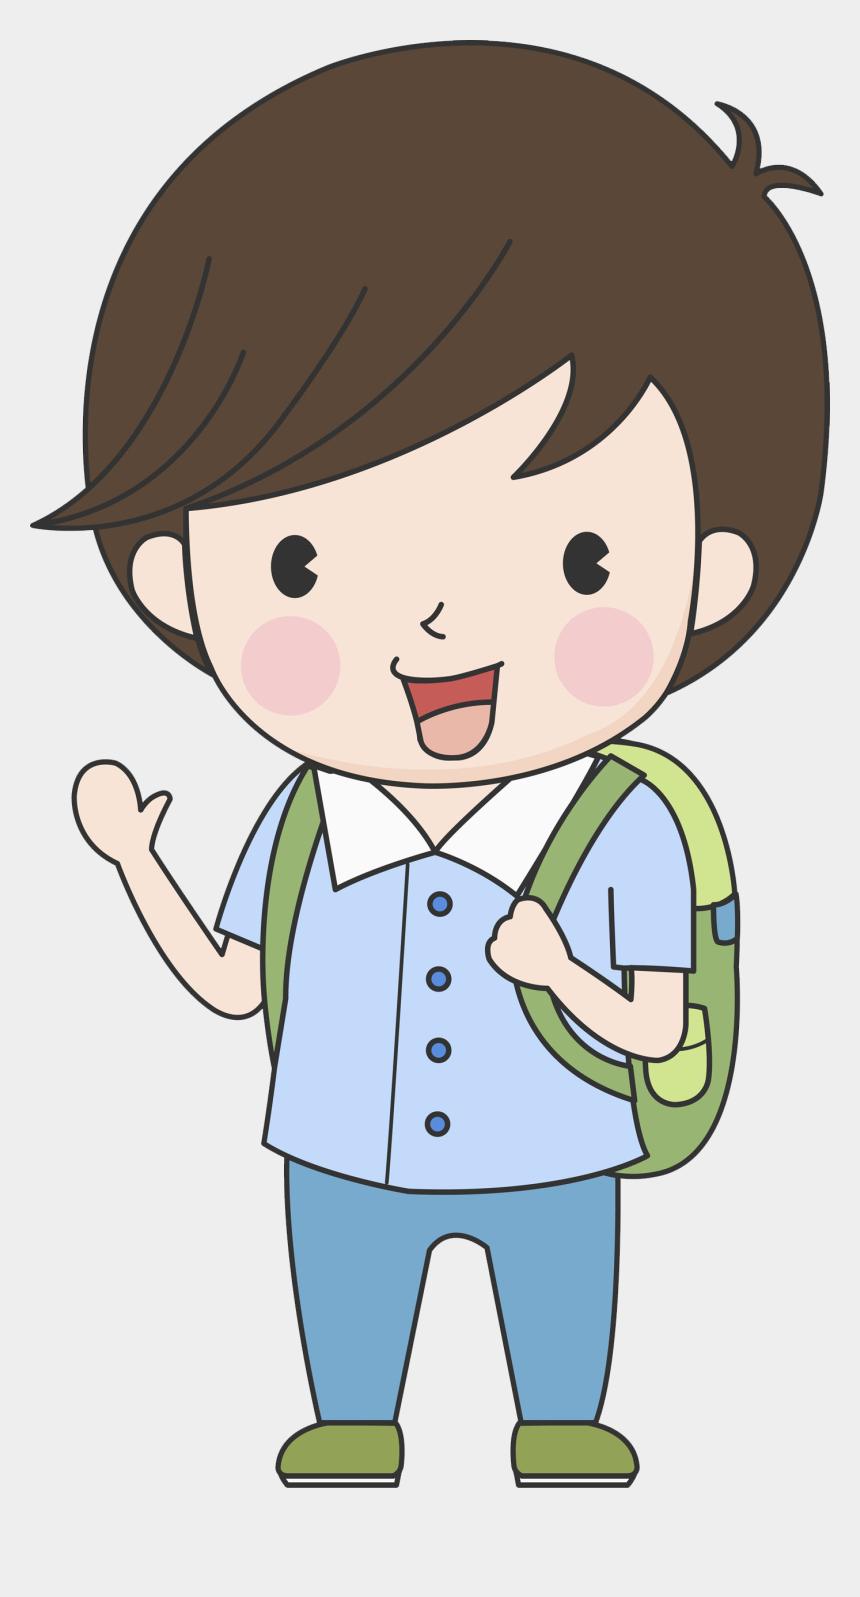 school kid clipart, Cartoons - Paper Child Material Clip Art School Transprent Ⓒ - School Boy Clipart Png